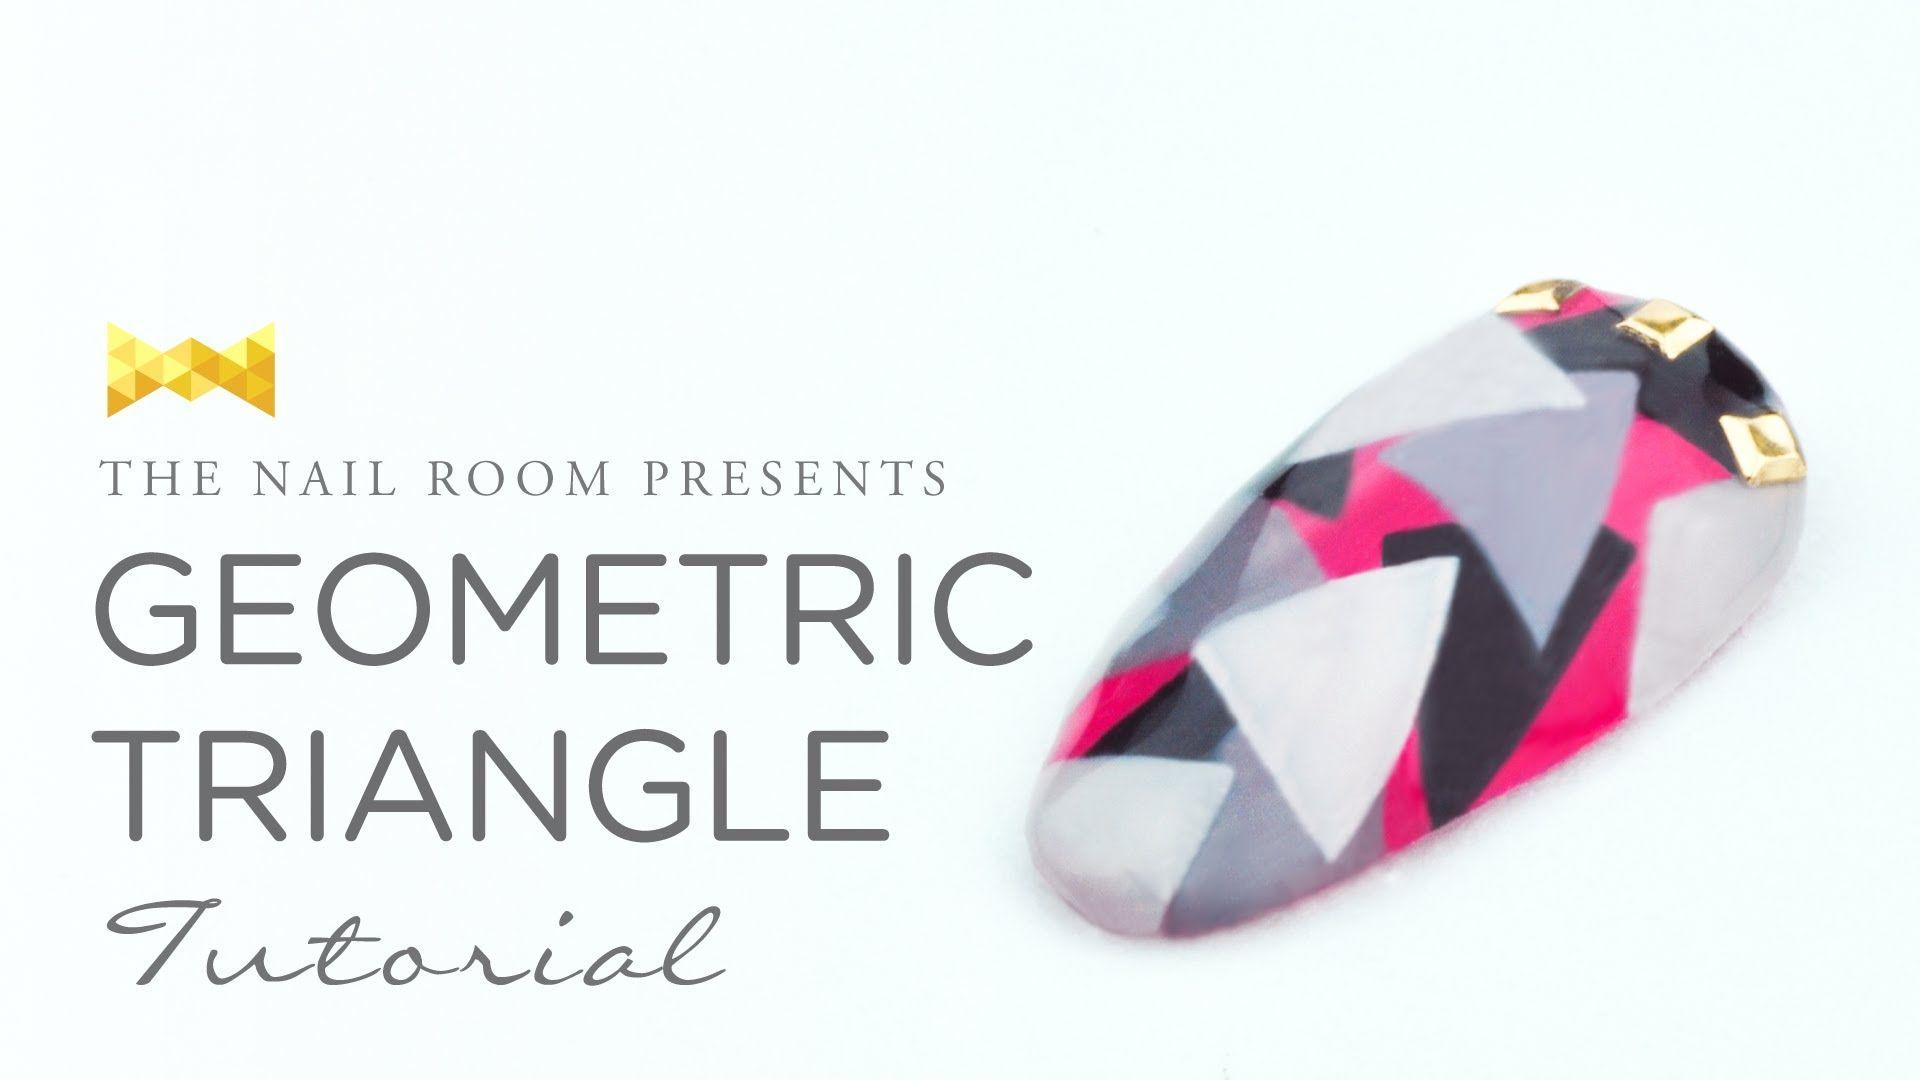 Geometric Triangle Nail Art - Japanese Nail Art Tutorial [HD] | Nail ...